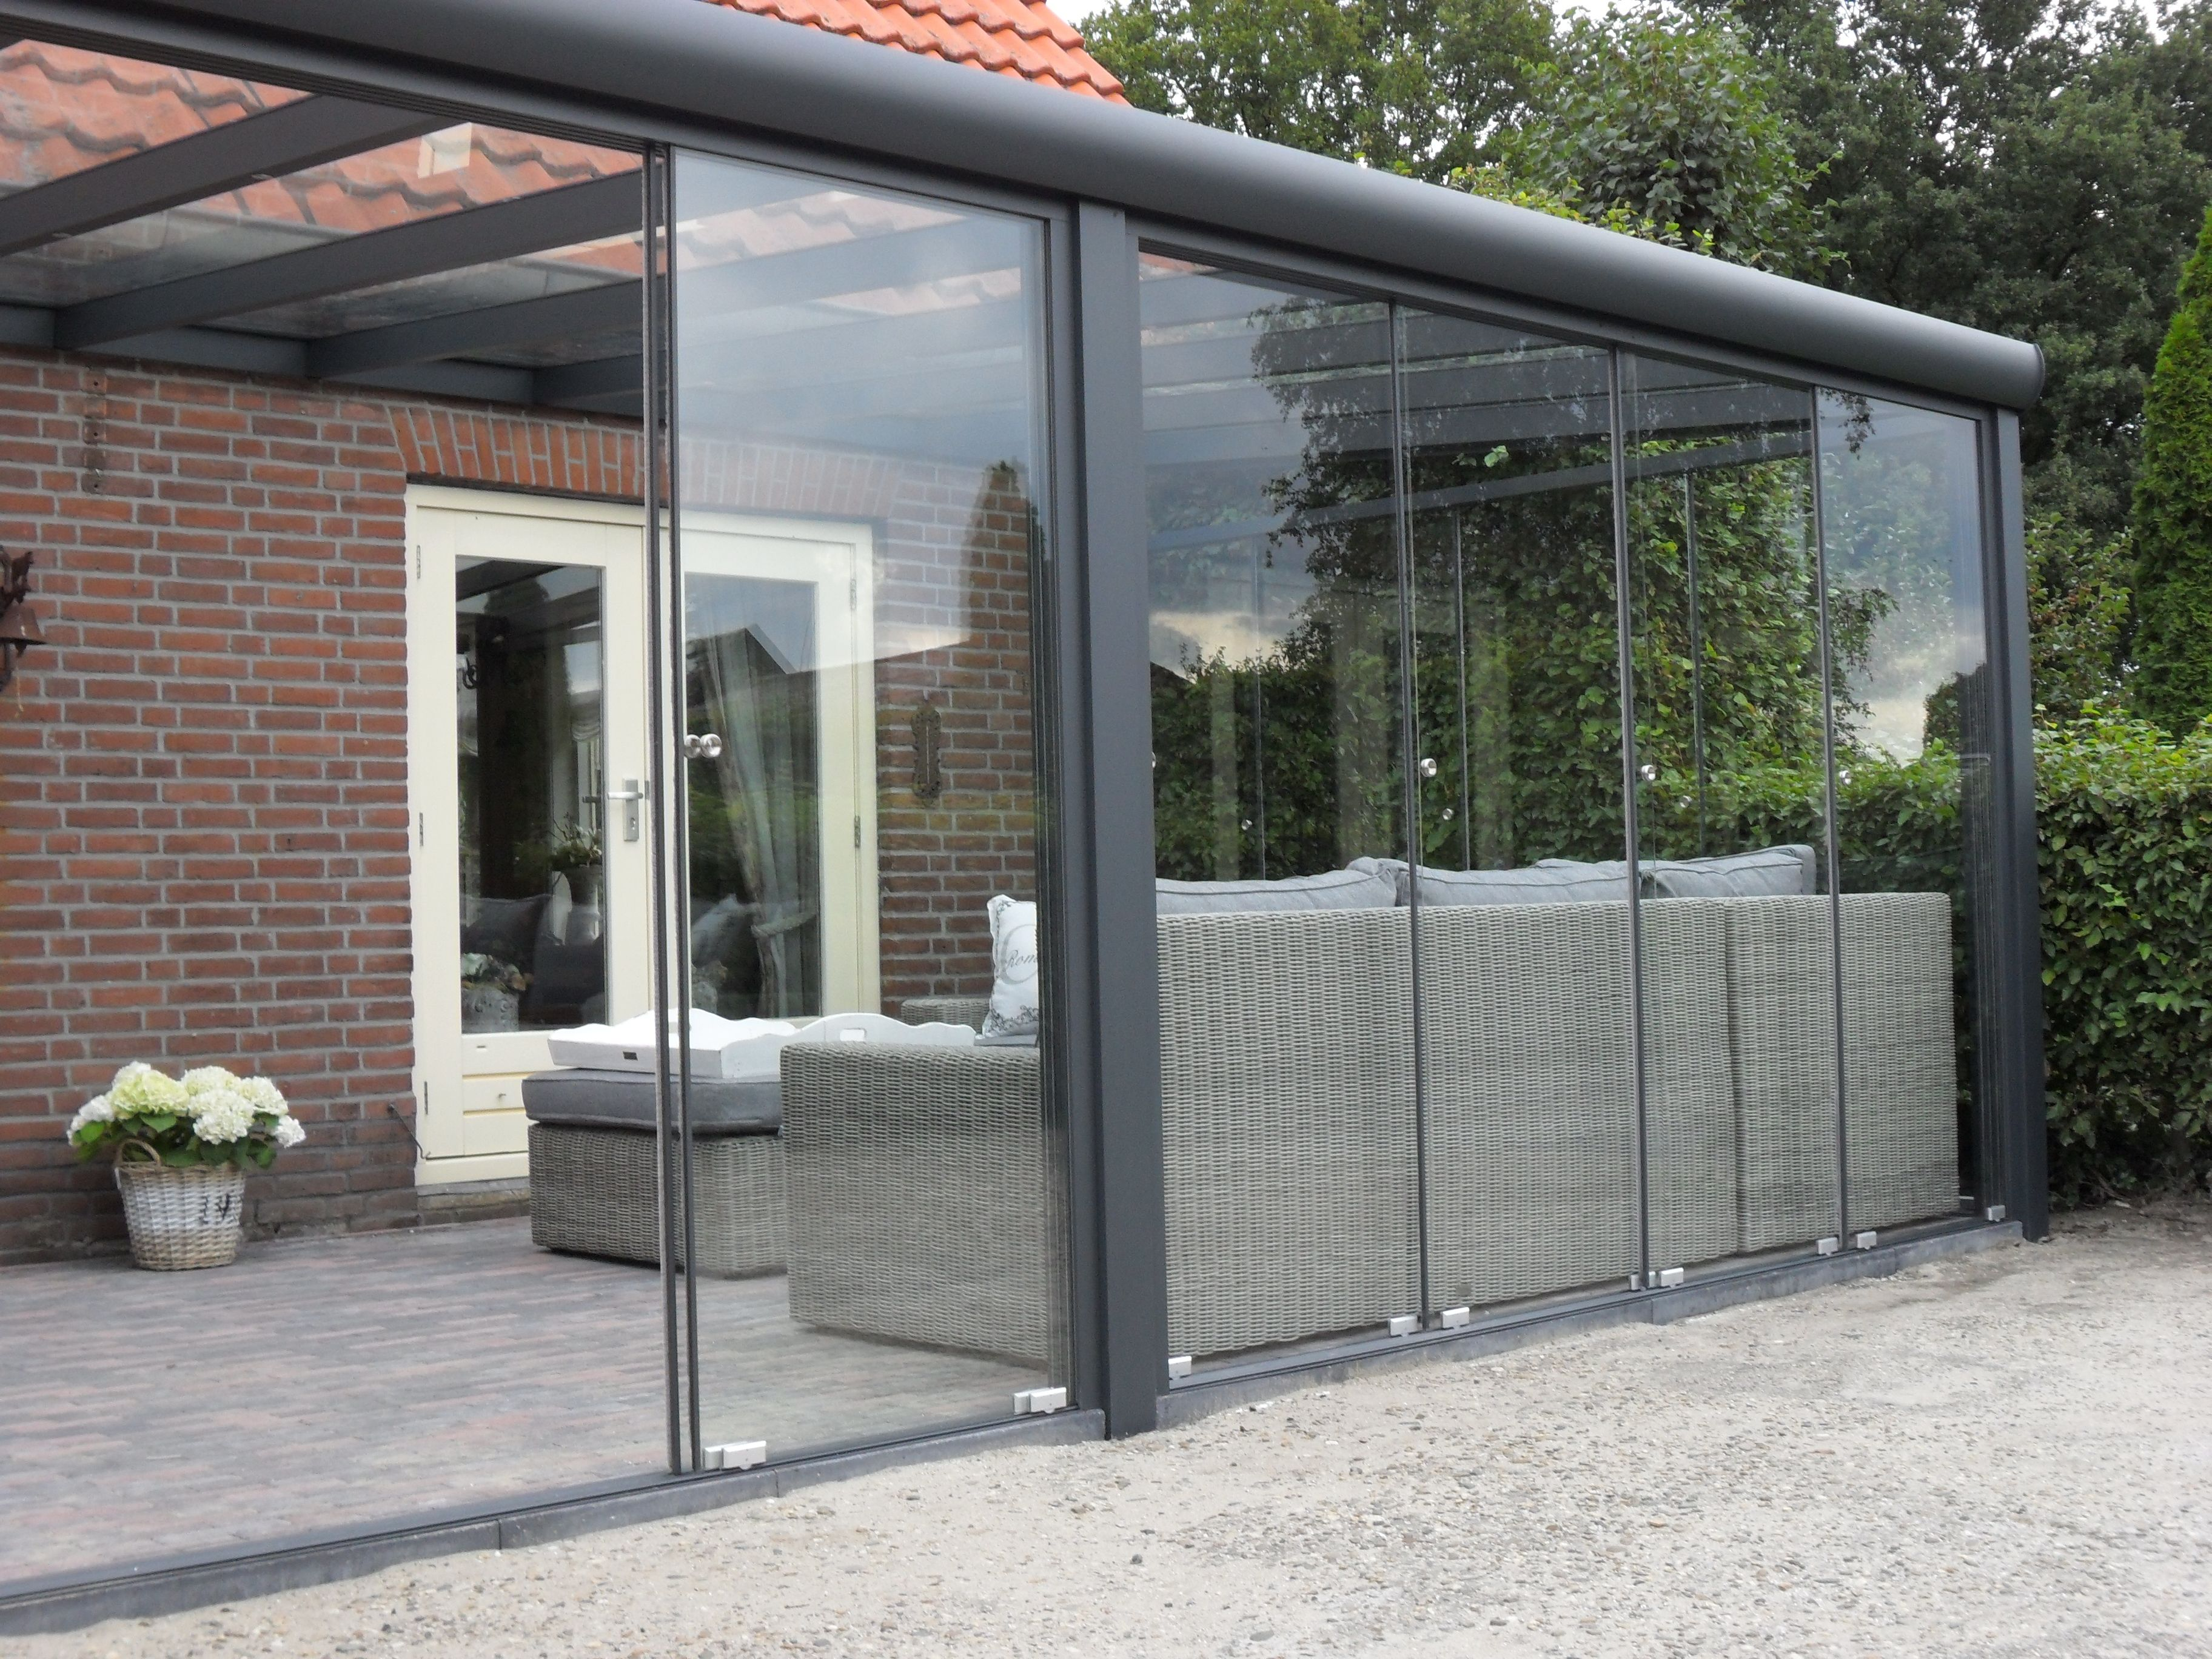 Aluminium terrasoverkapping veranda met glasschuifwandsysteem - Overdekt terras in aluminium ...